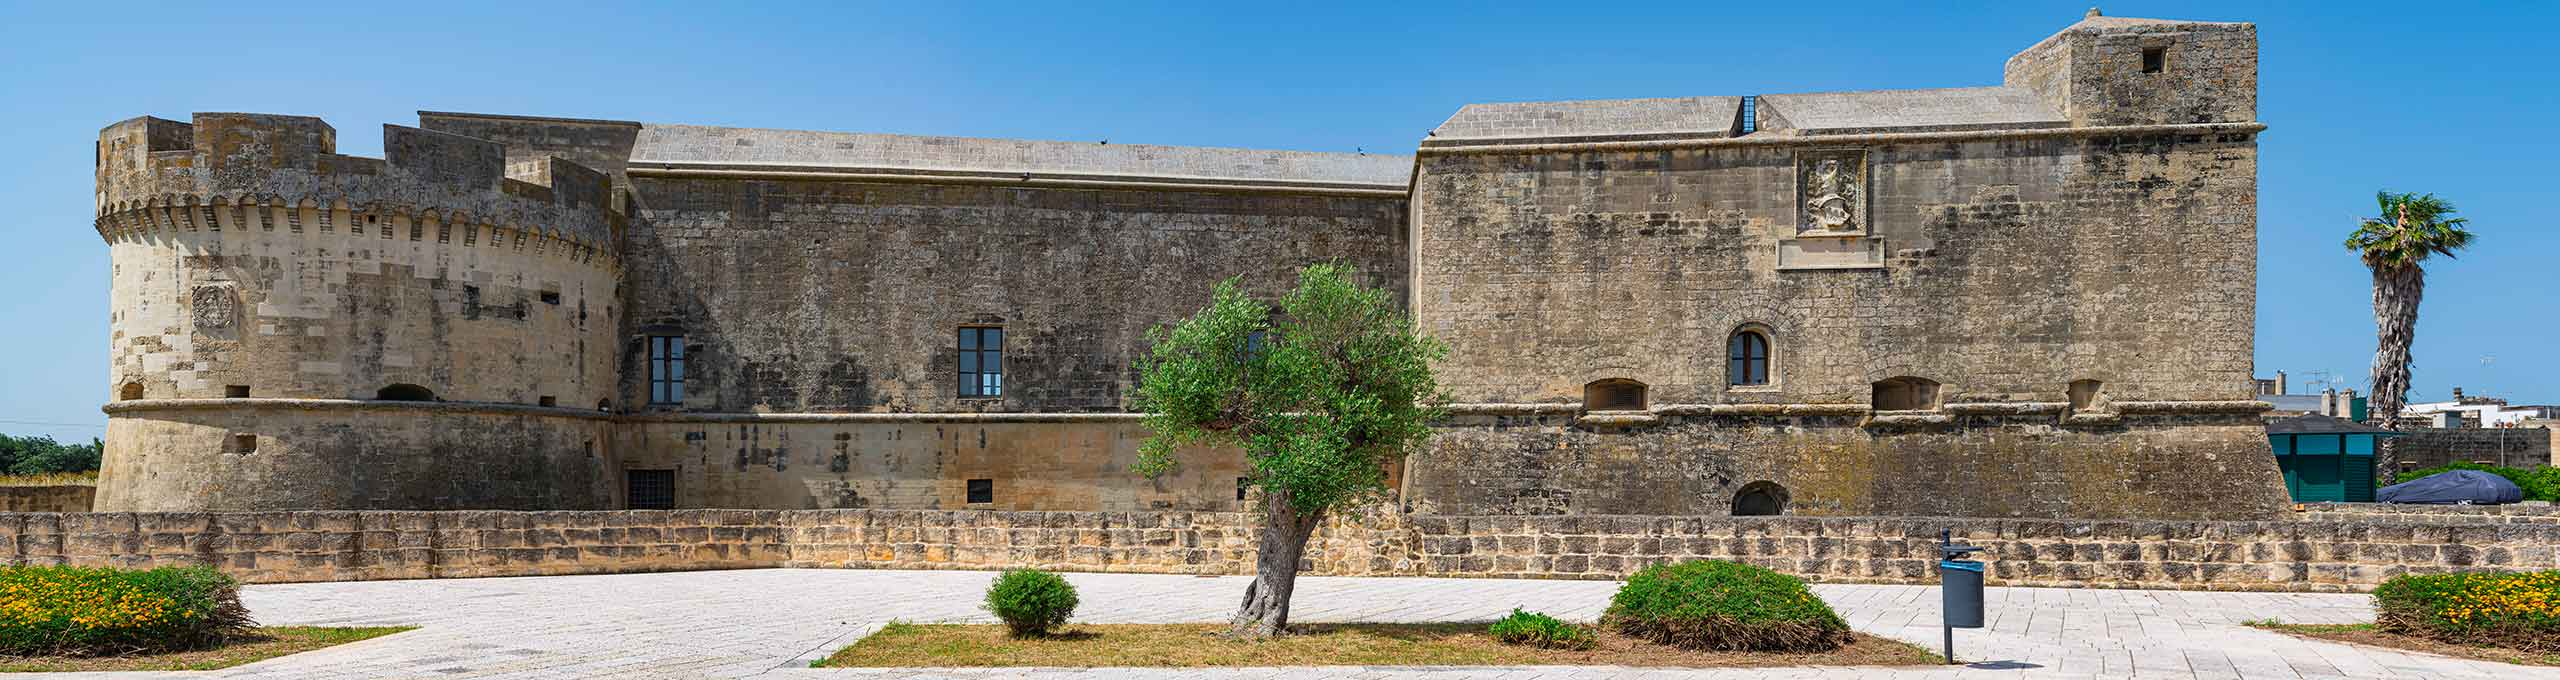 Vernole, Salento,  Castello di Acaya